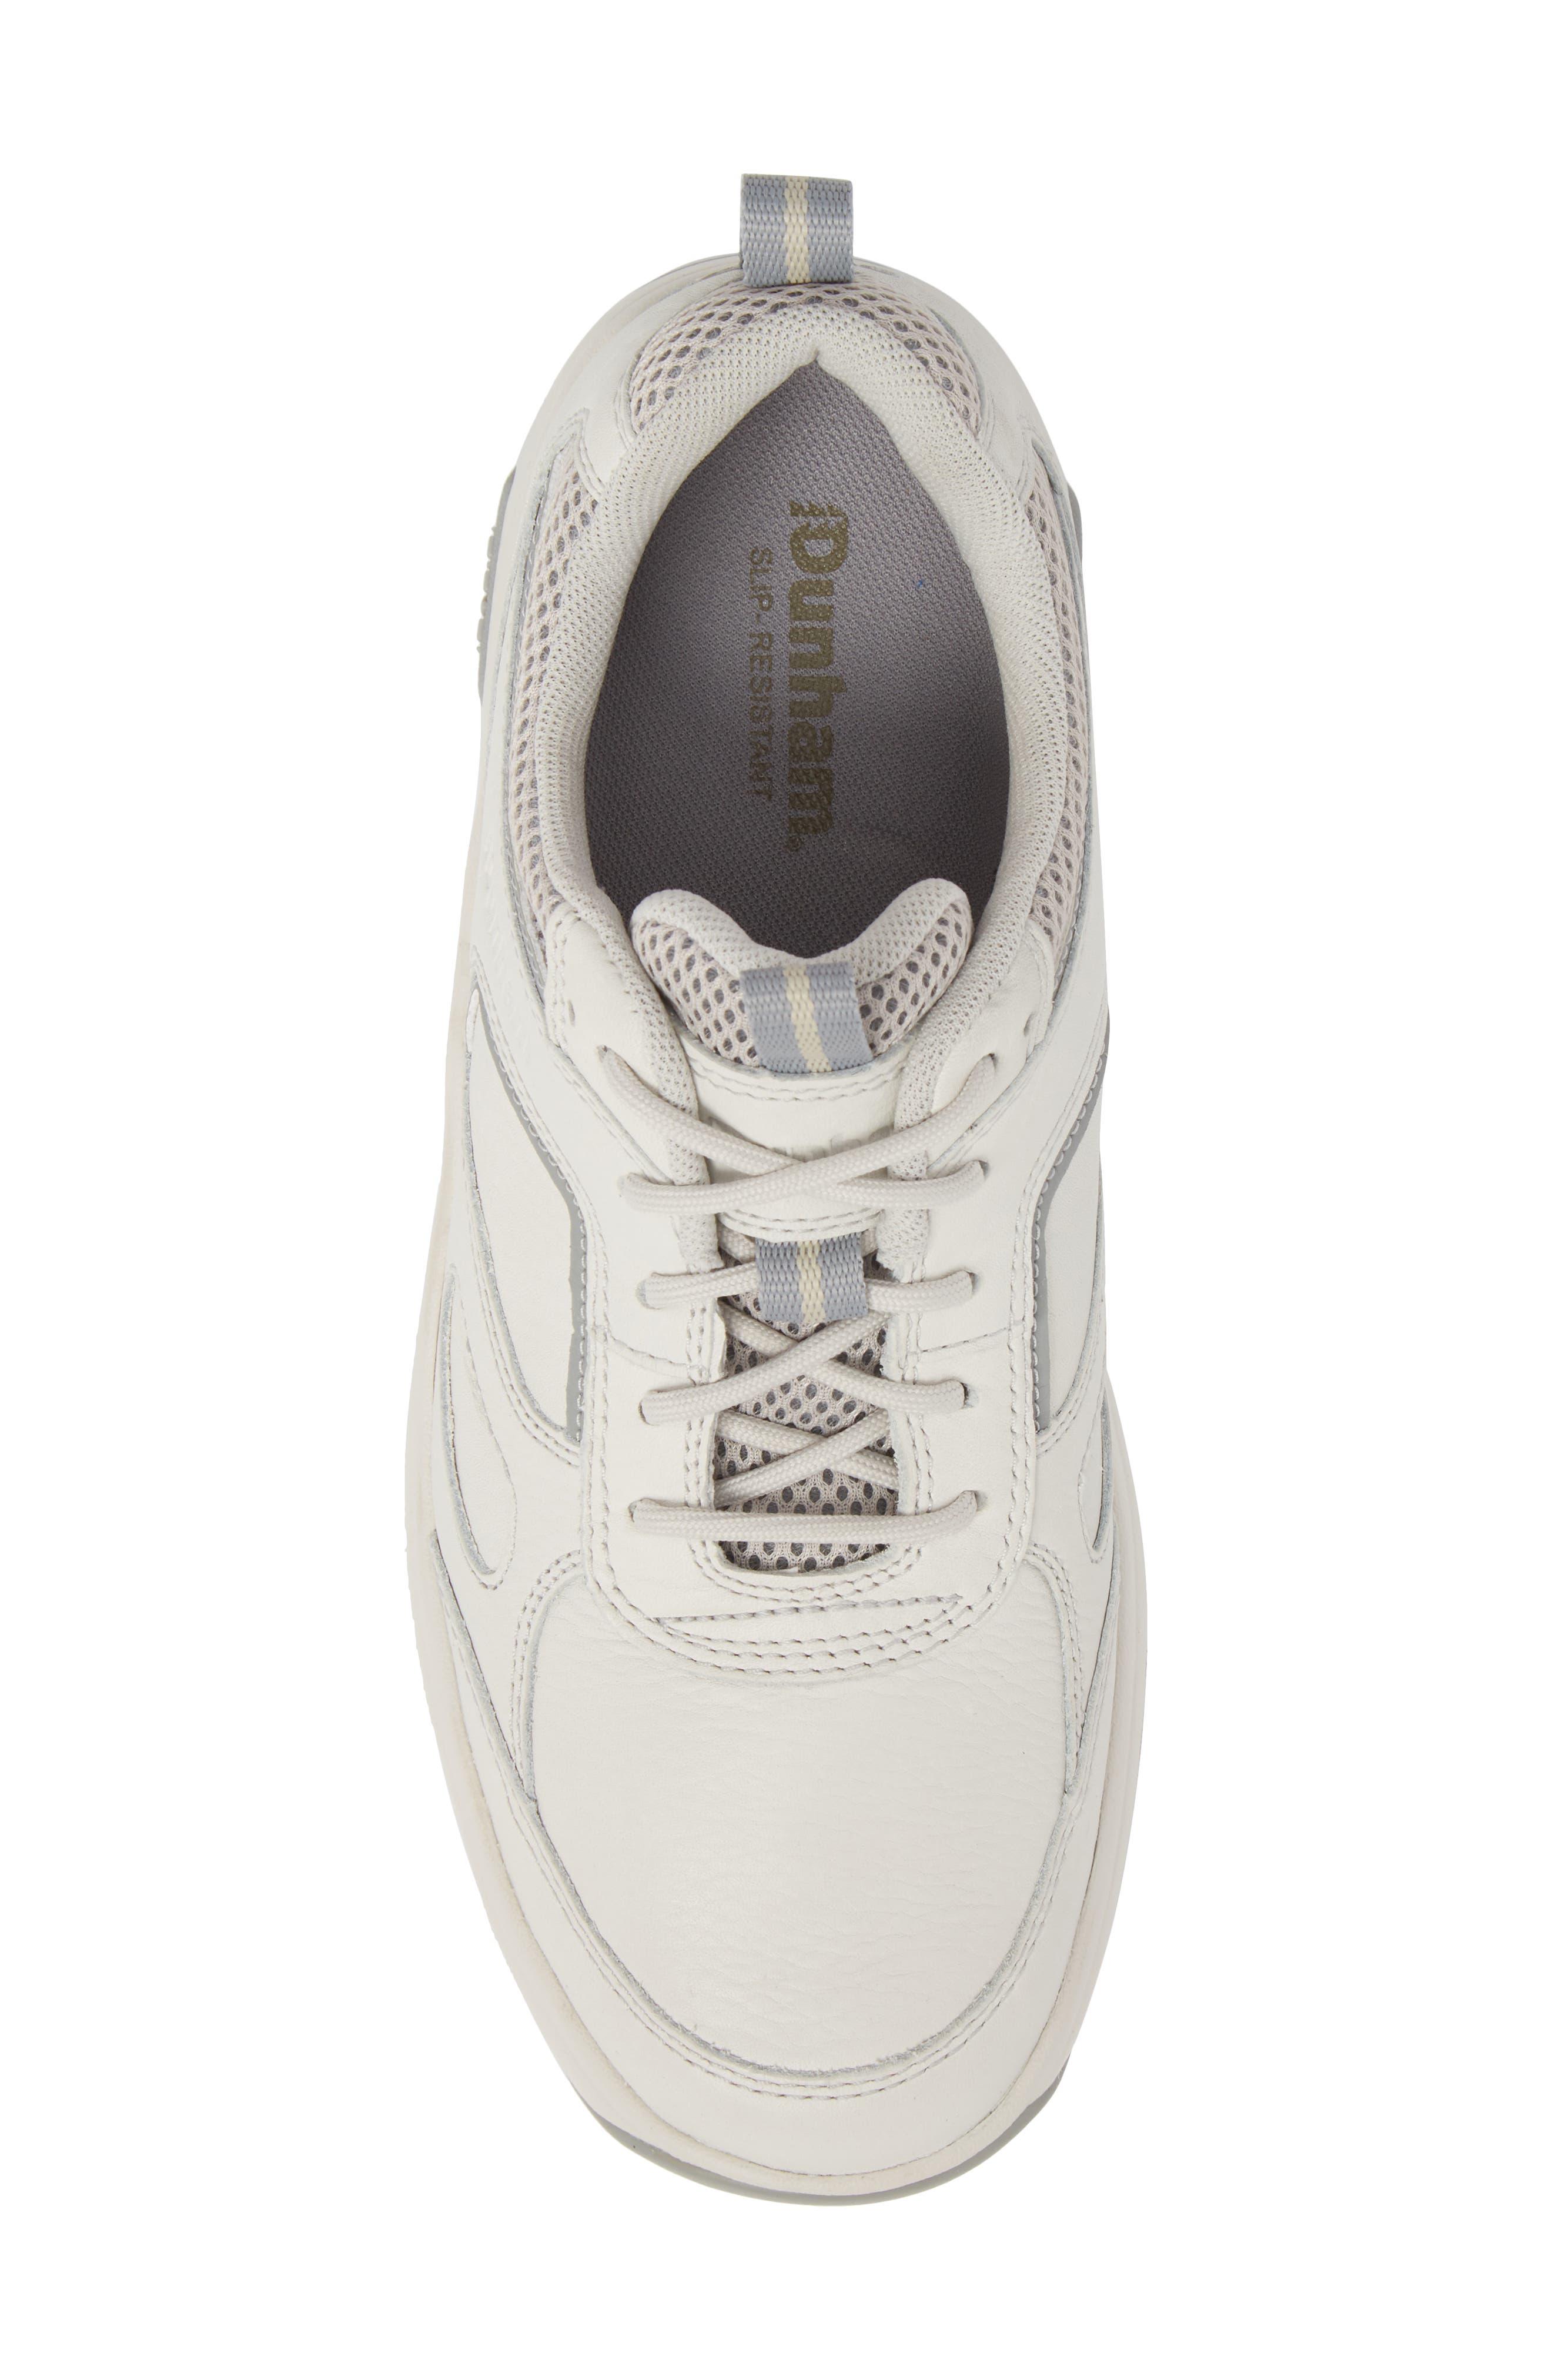 8000 Uball Sneaker,                             Alternate thumbnail 4, color,                             Off White Leather